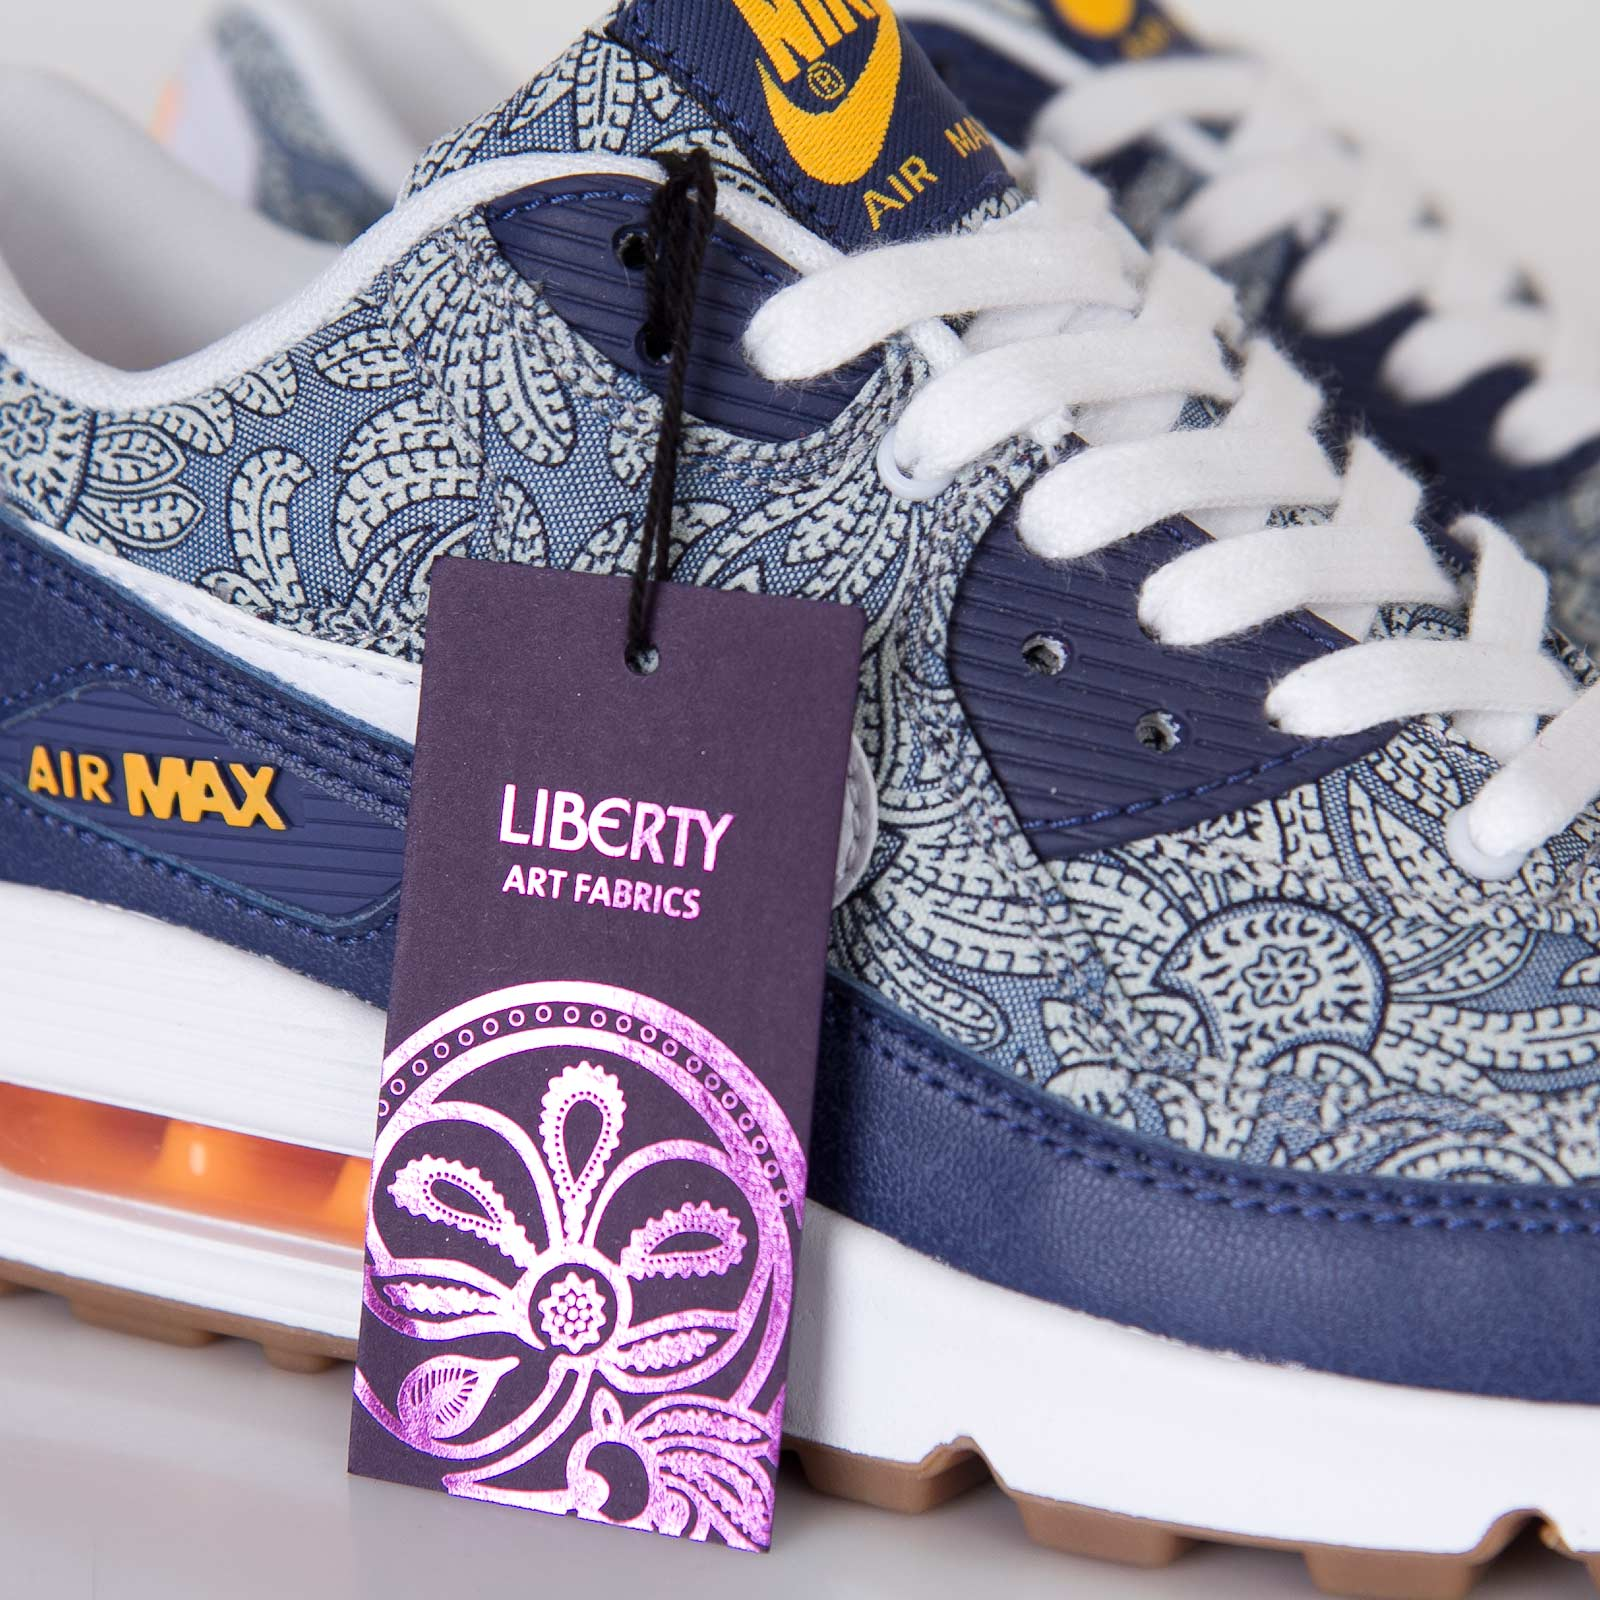 finest selection 4fb0d 6893f ... womens nike shoes roshe runs blue dope sneakers nike air max 90  wheretoget 8e386 b0318  order nike wmns air max 90 liberty qs aec05 801cc